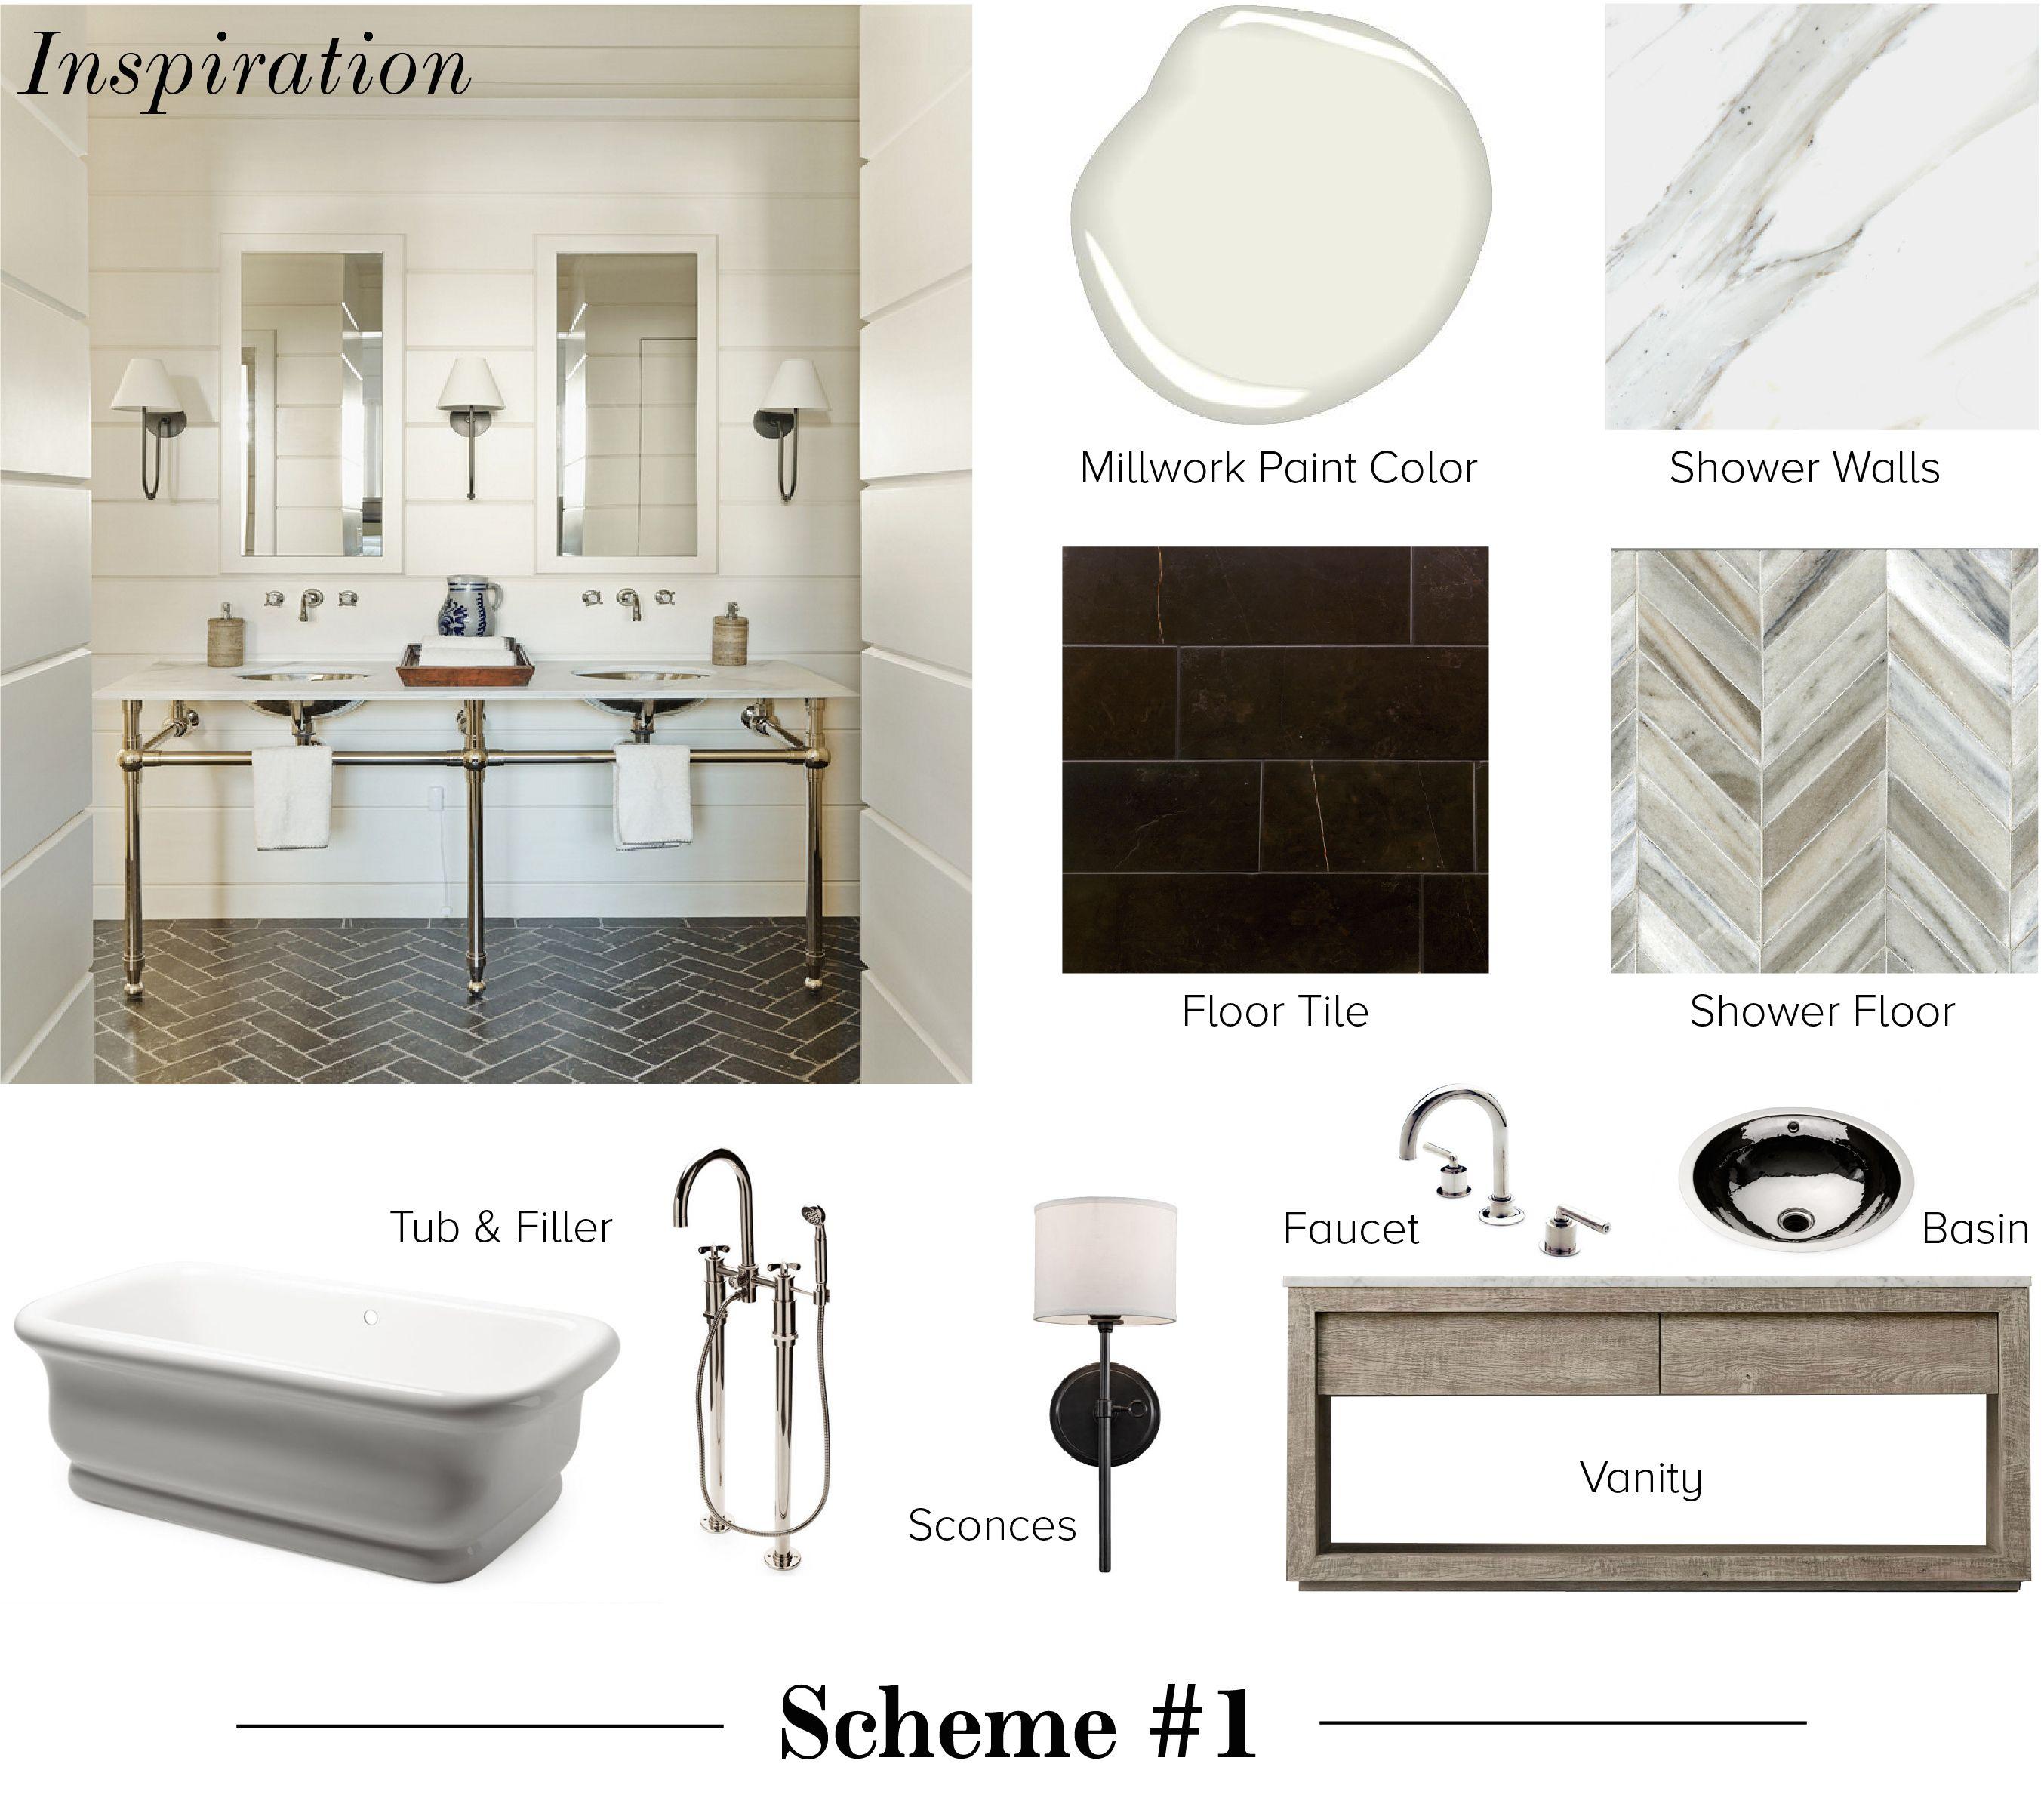 Bathroom Design – Selecting Natural Stone & Tile | McGrath II Blog ...